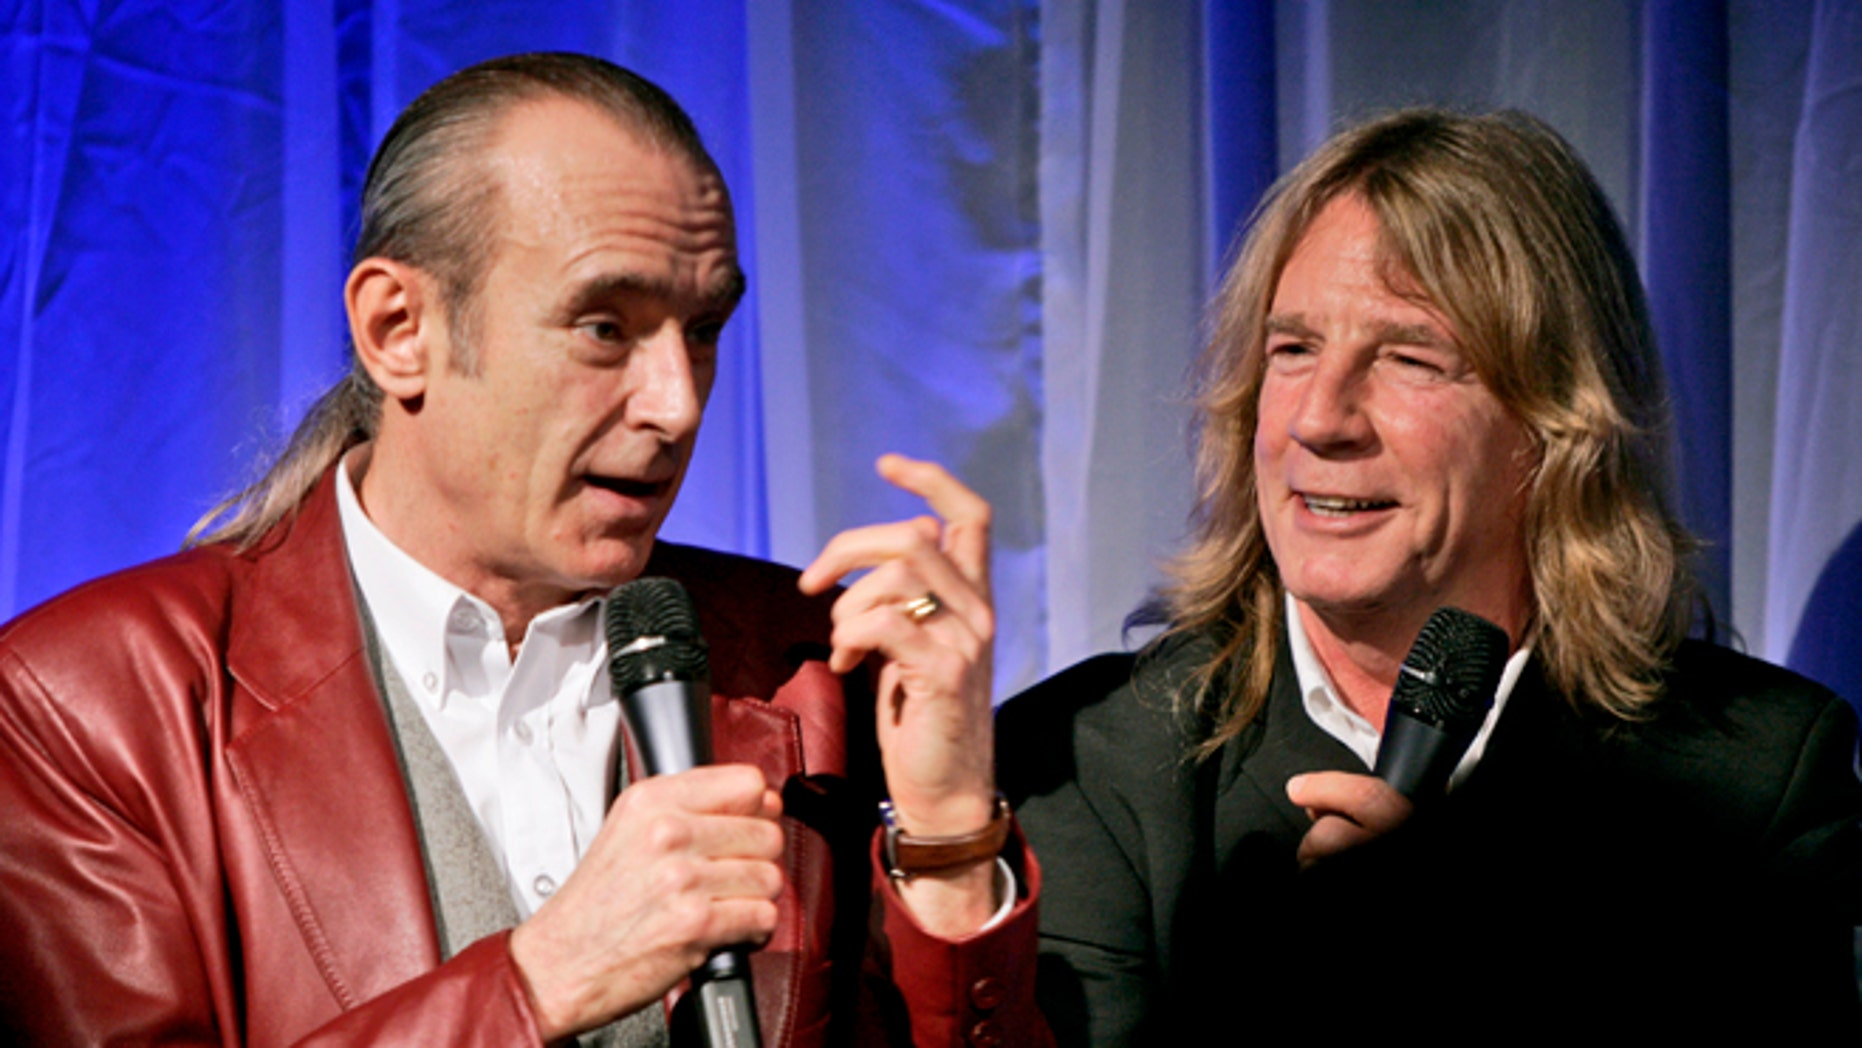 Status Quo members Francis Rossi (left) and Rick Parfitt. Parfitt has died at age 68.